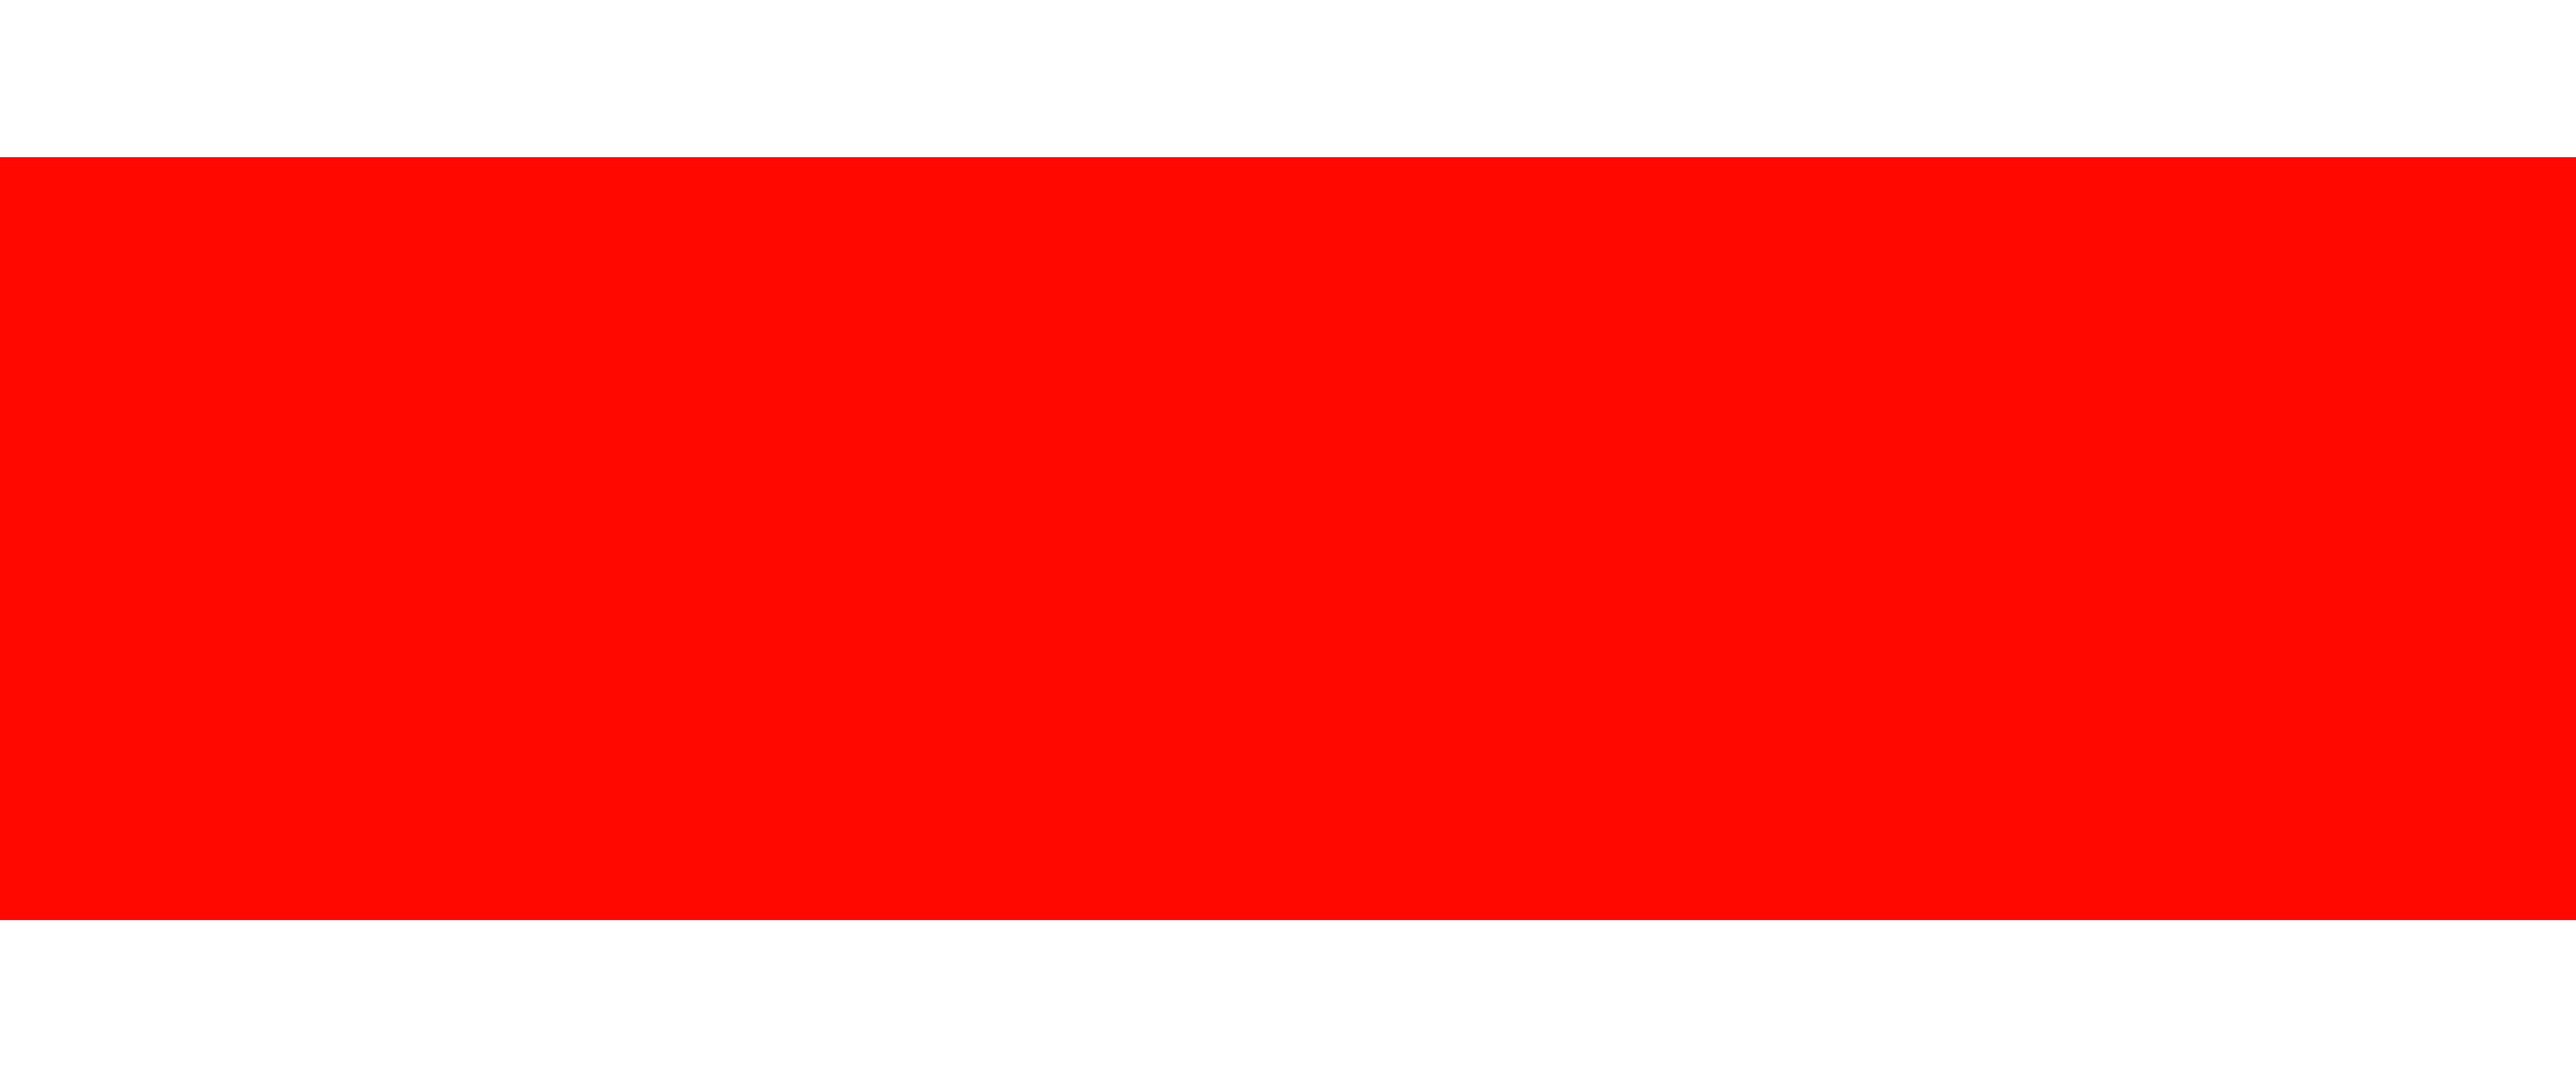 Being X GmbH